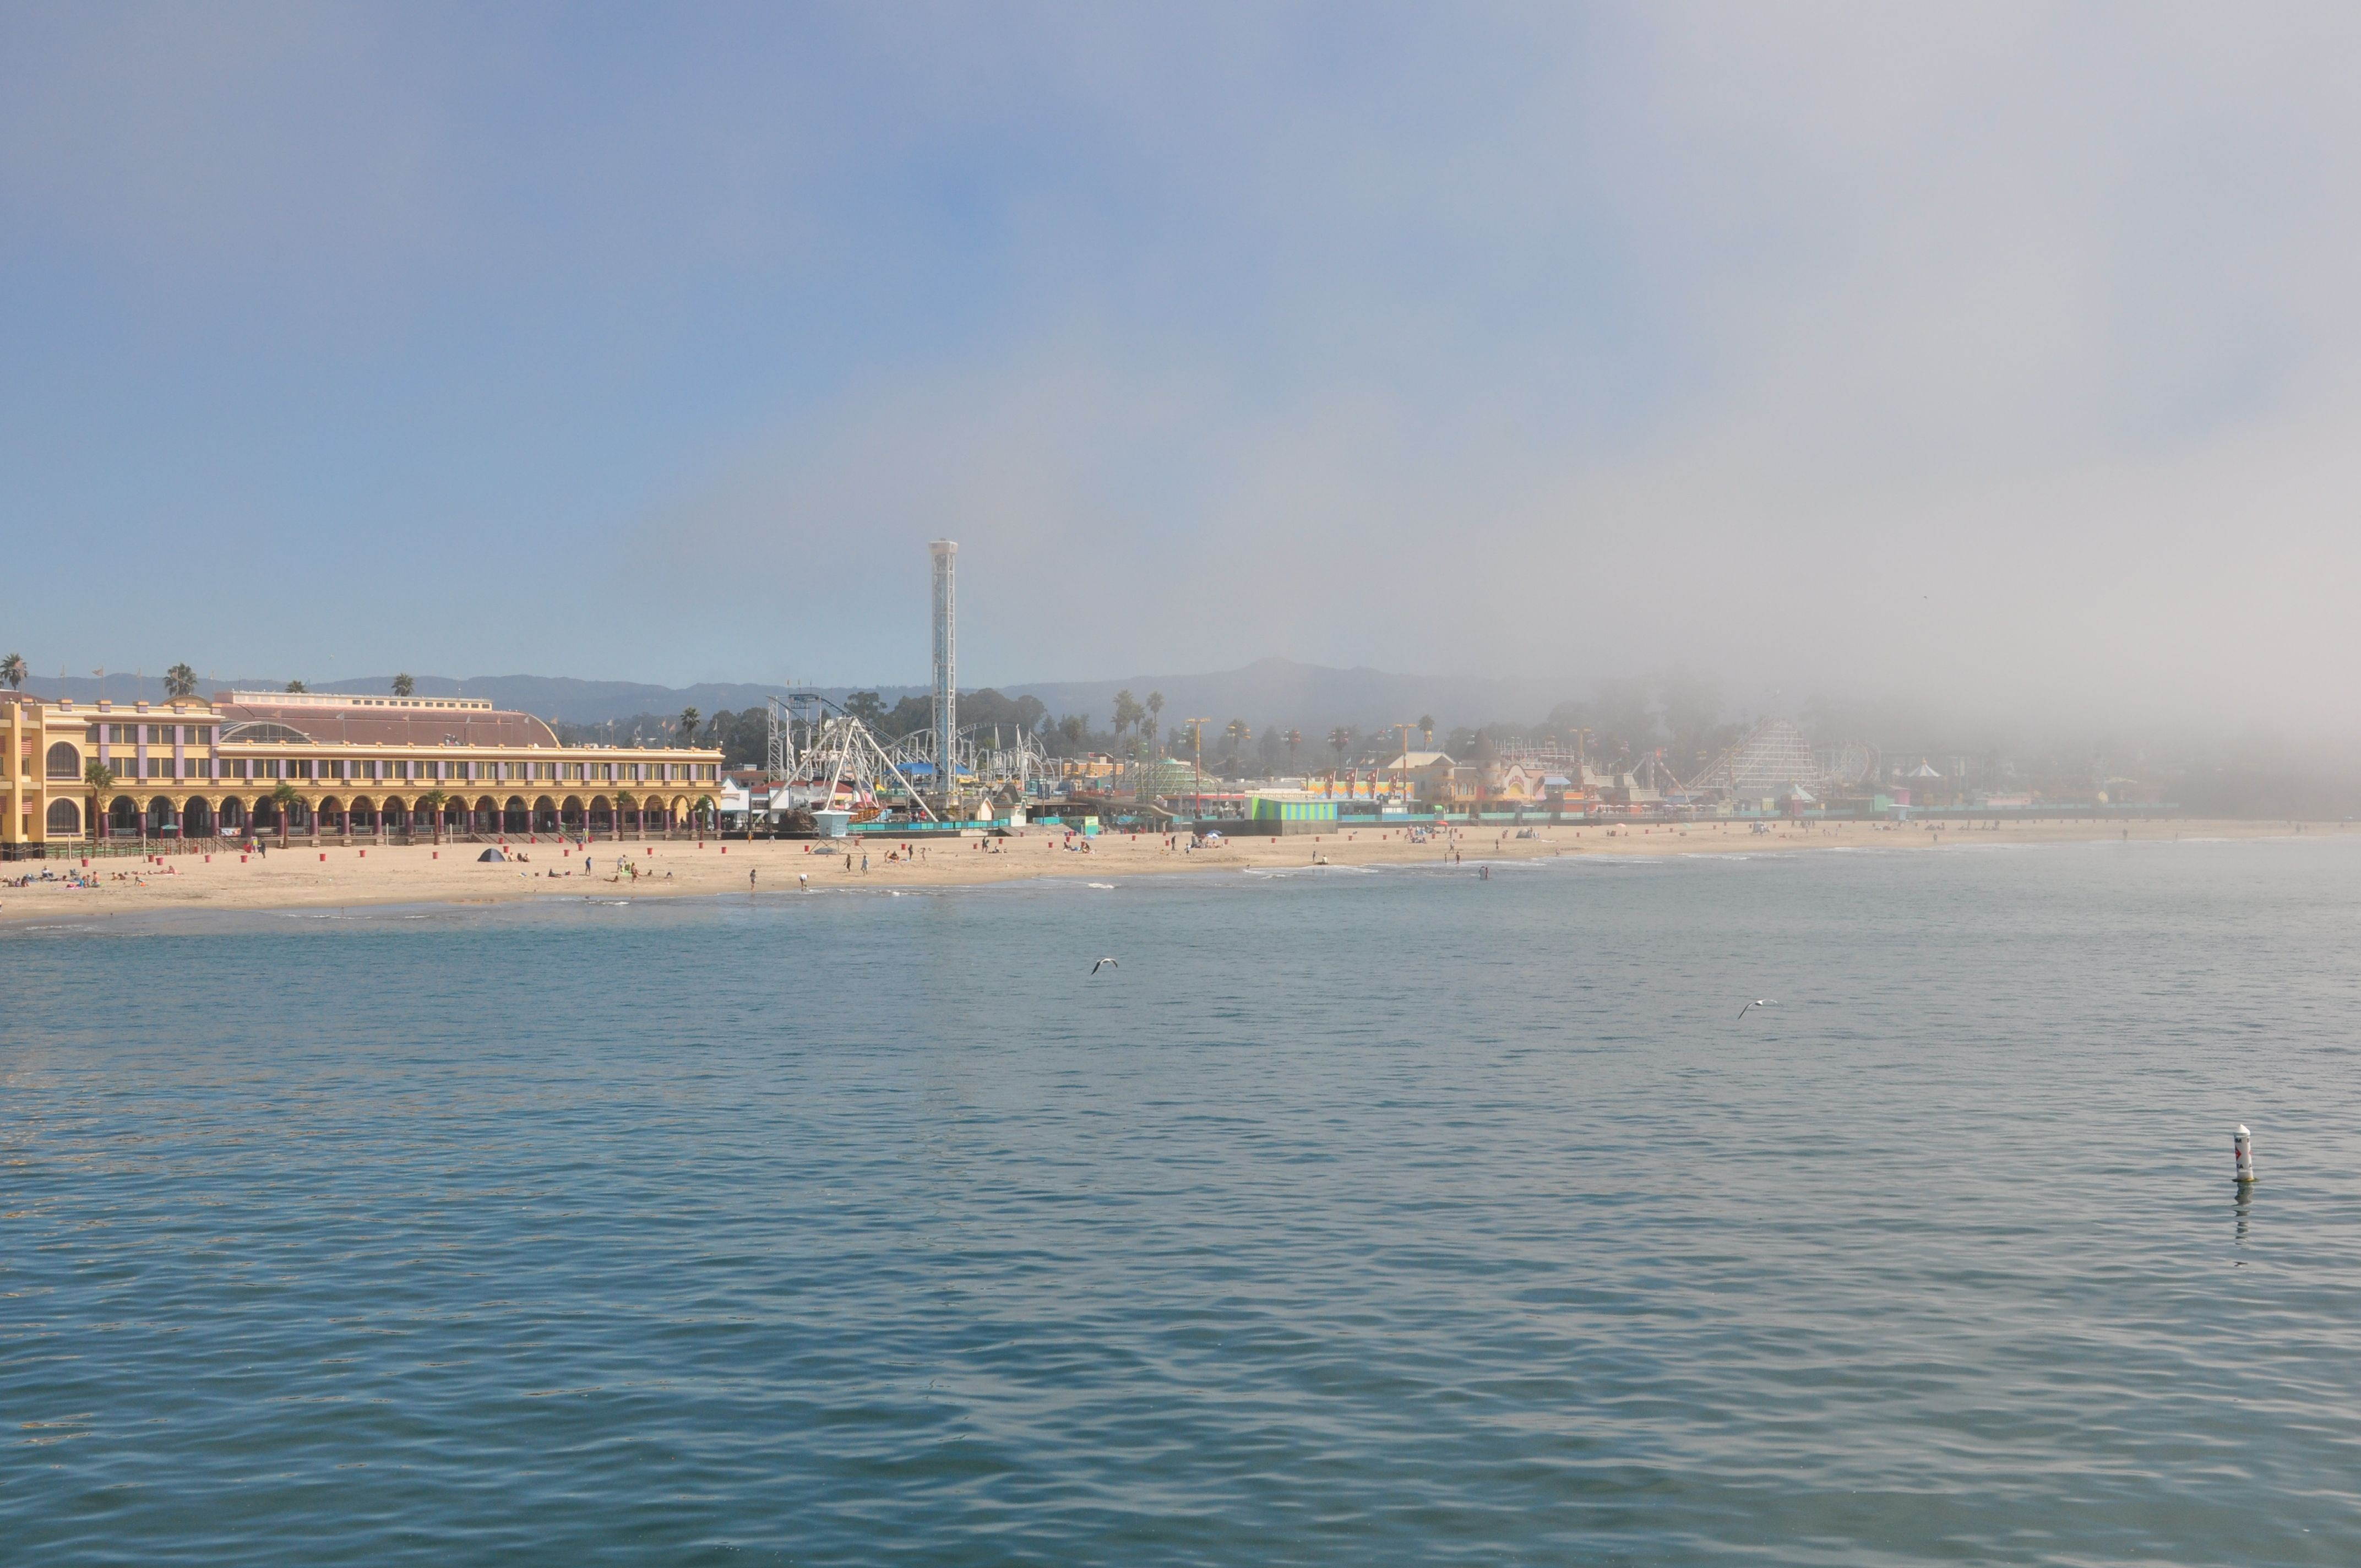 Santa Cruz Boardwalk, CA